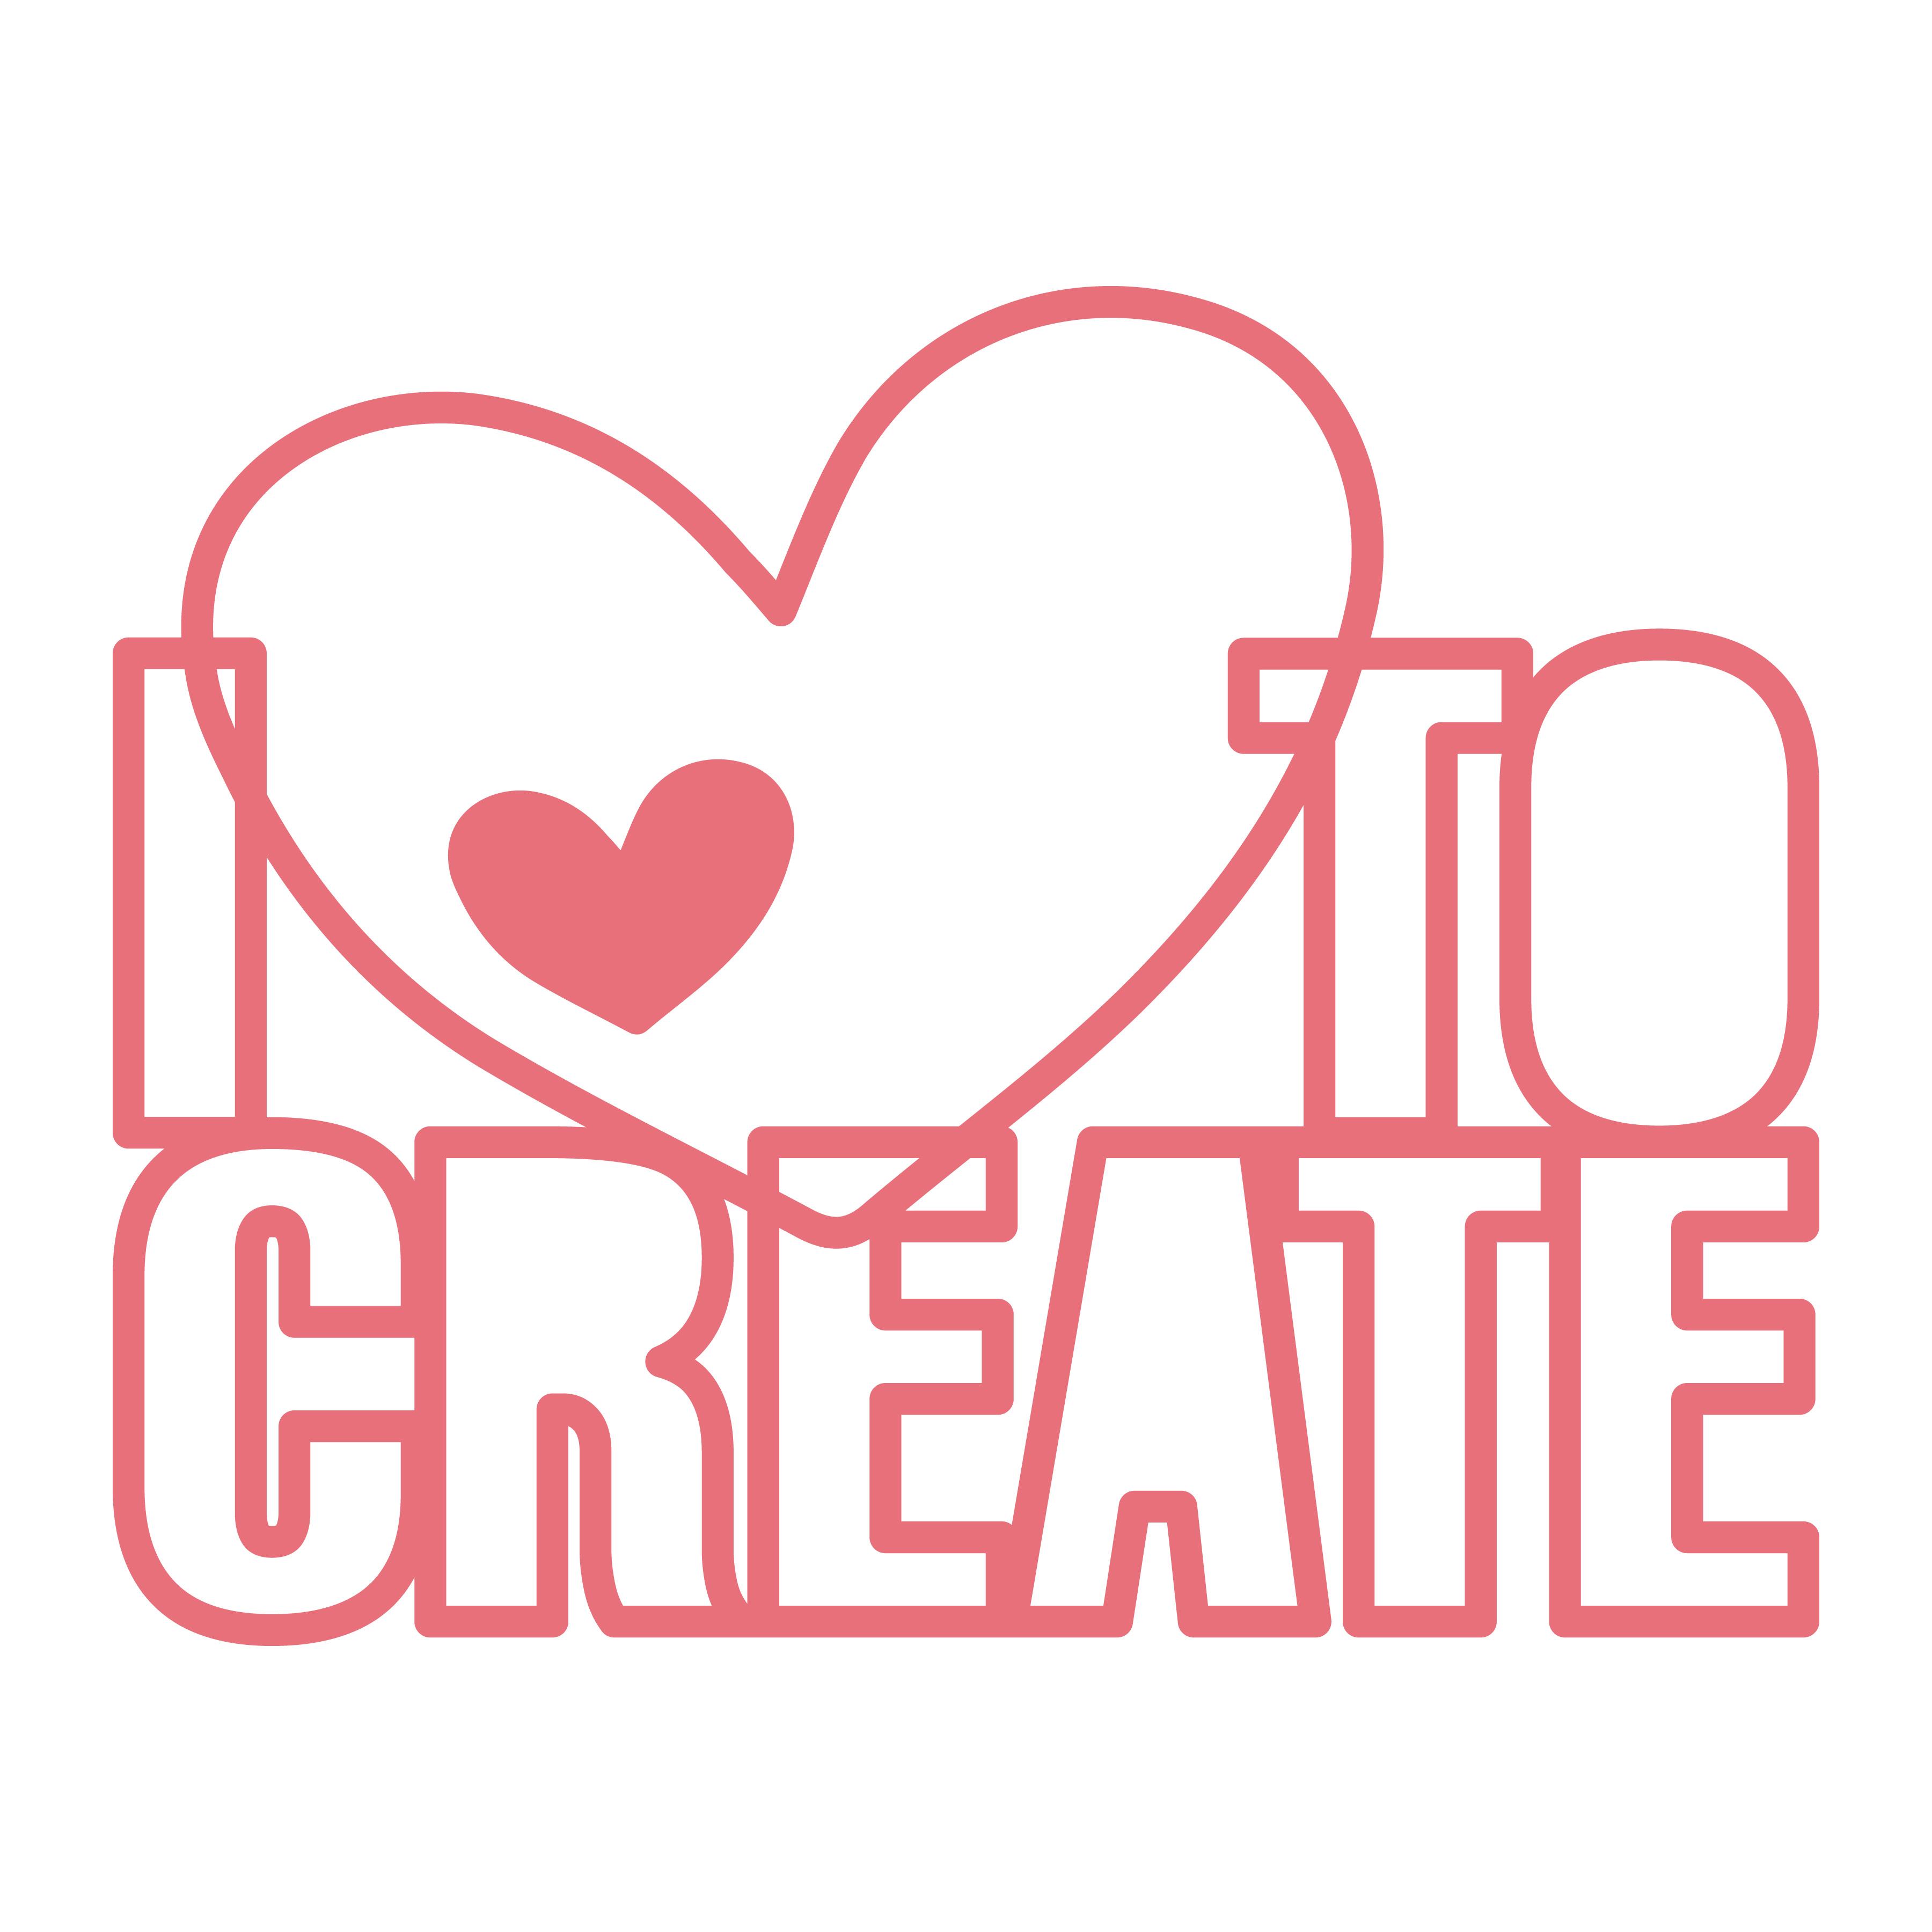 I love to create_Free svg cut file